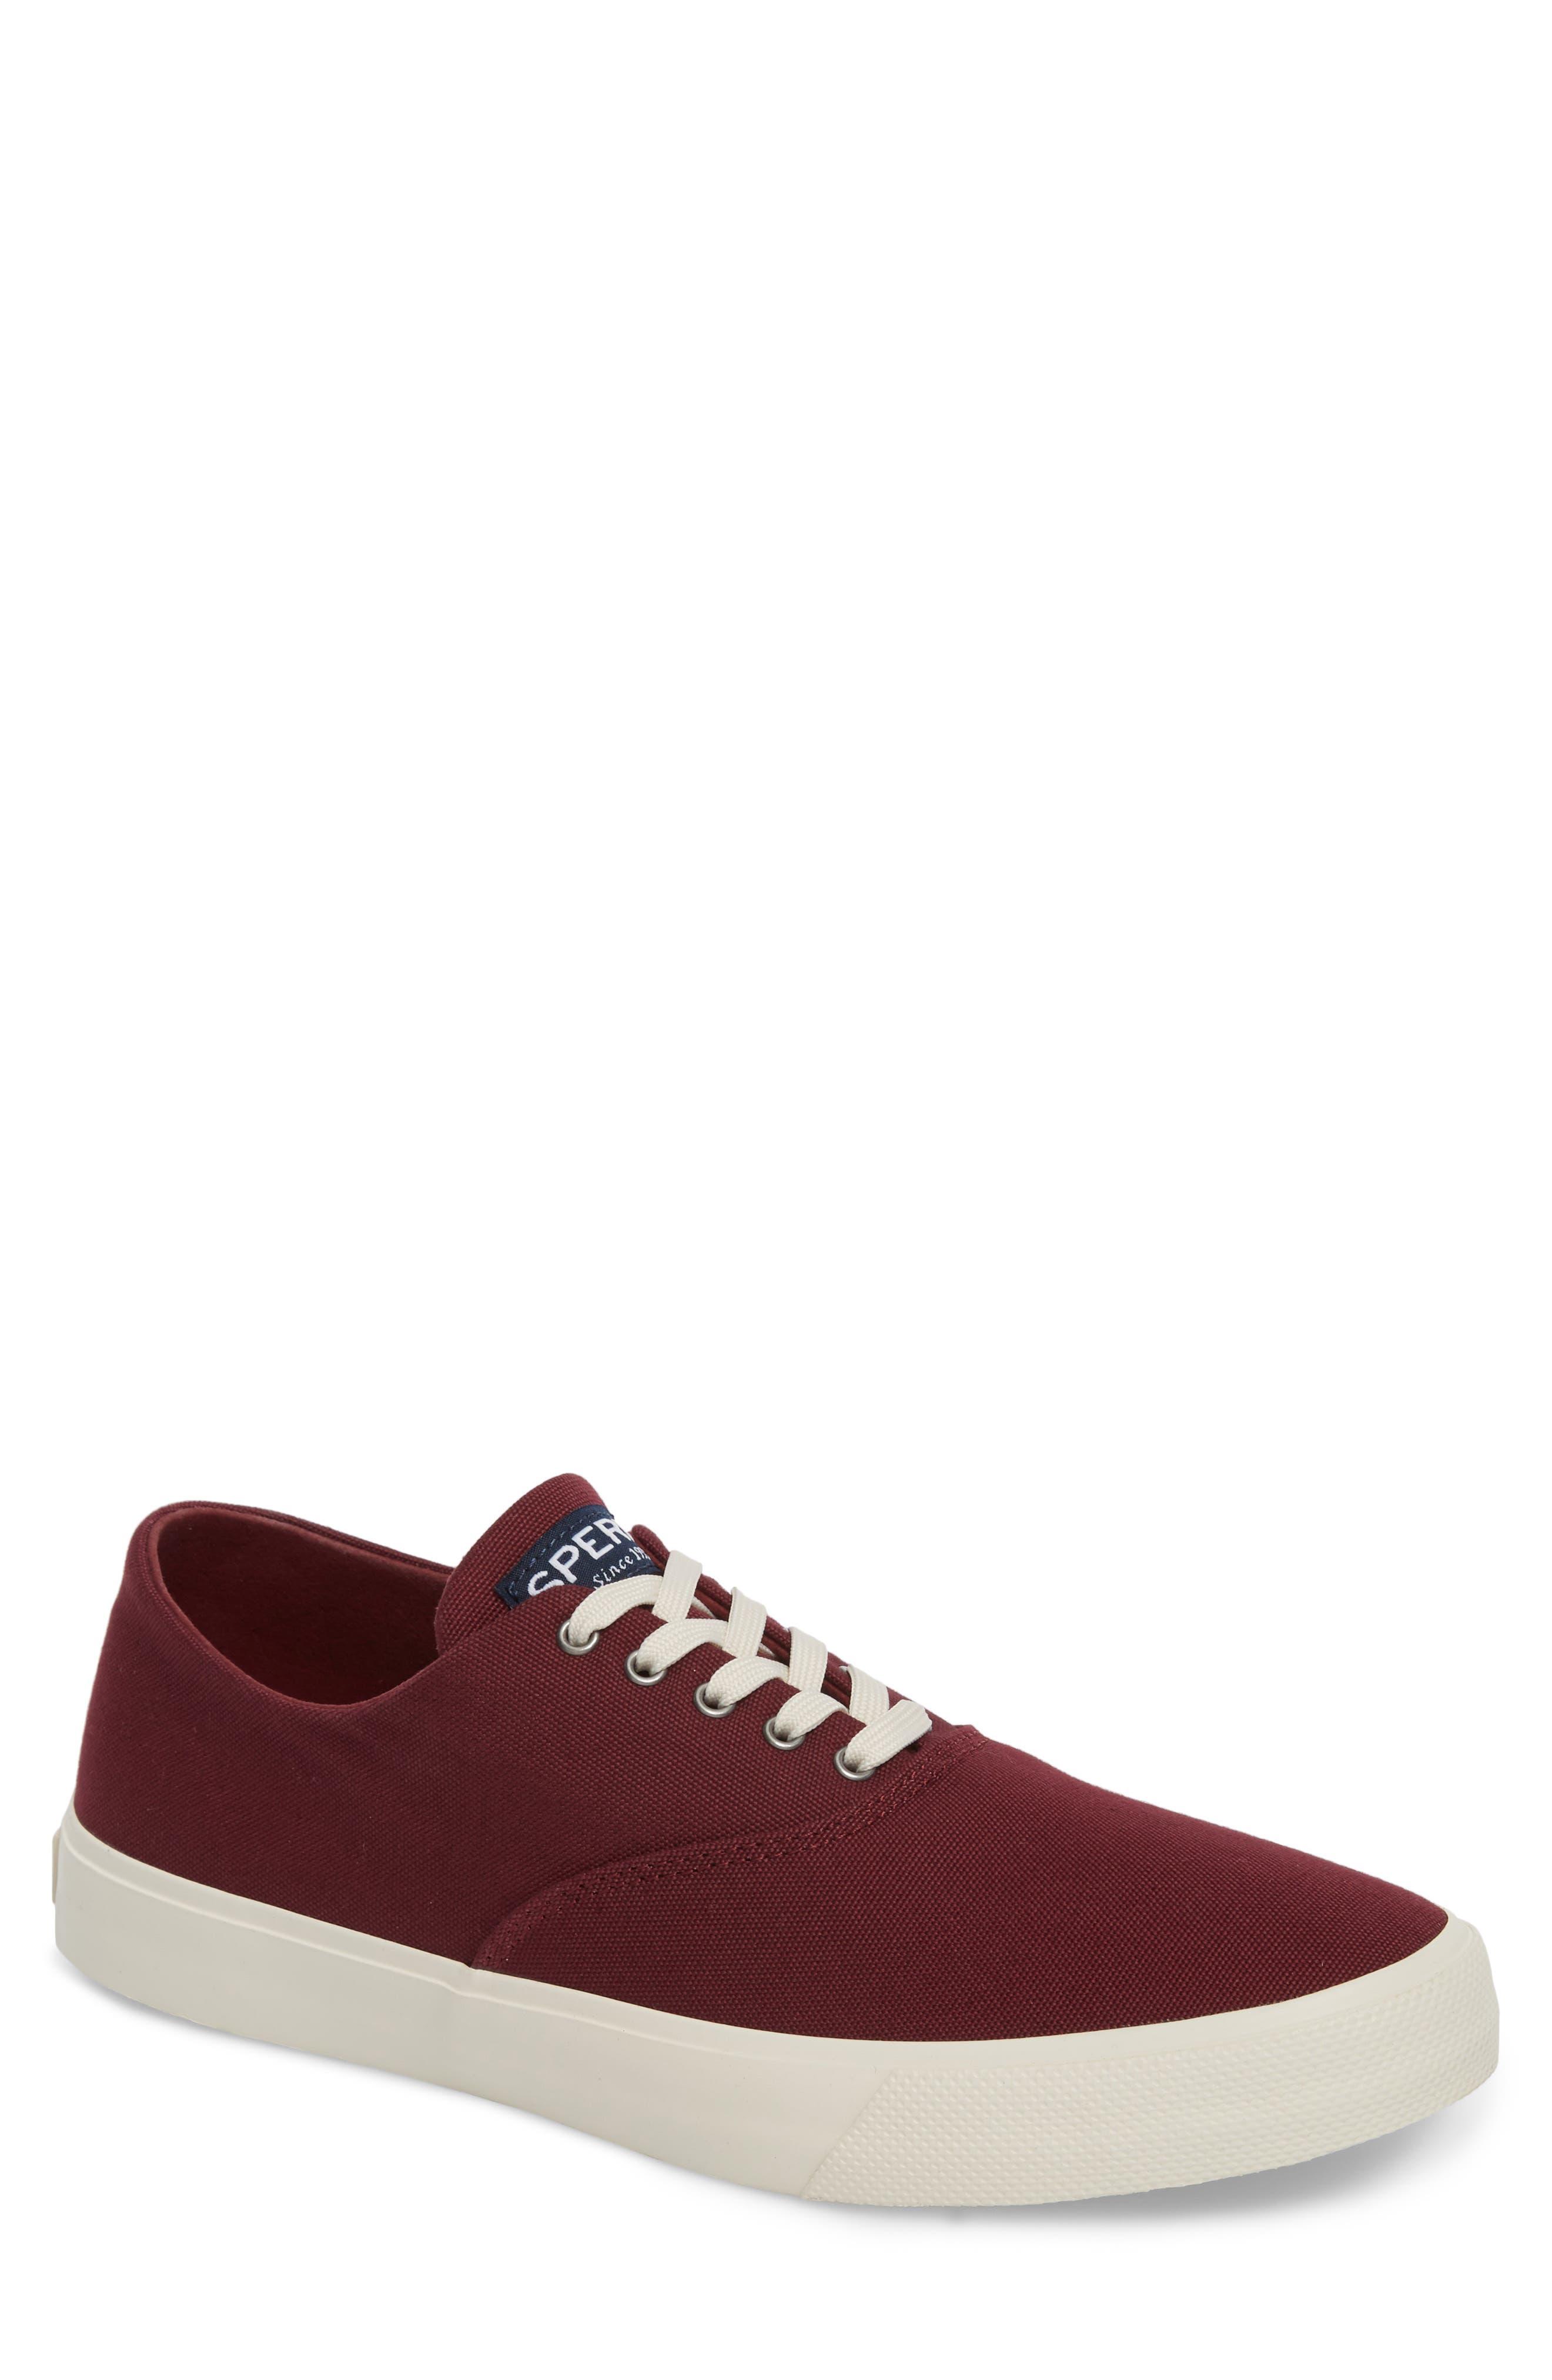 Captain's CVO Sneaker,                         Main,                         color, WINE FABRIC